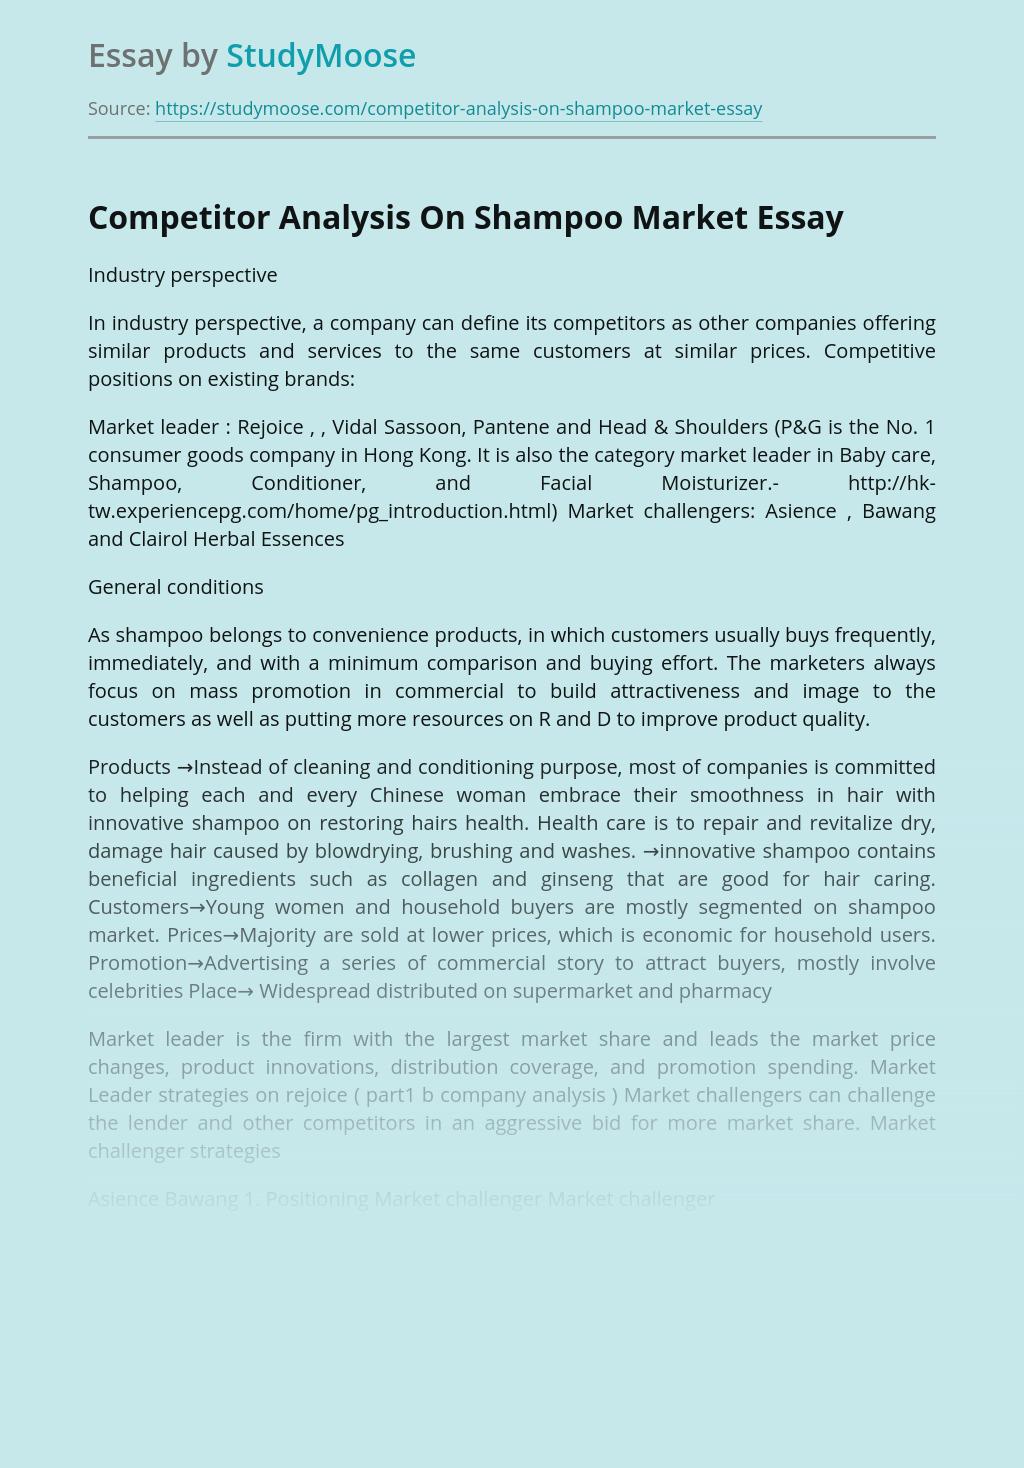 Competitor Analysis On Shampoo Market